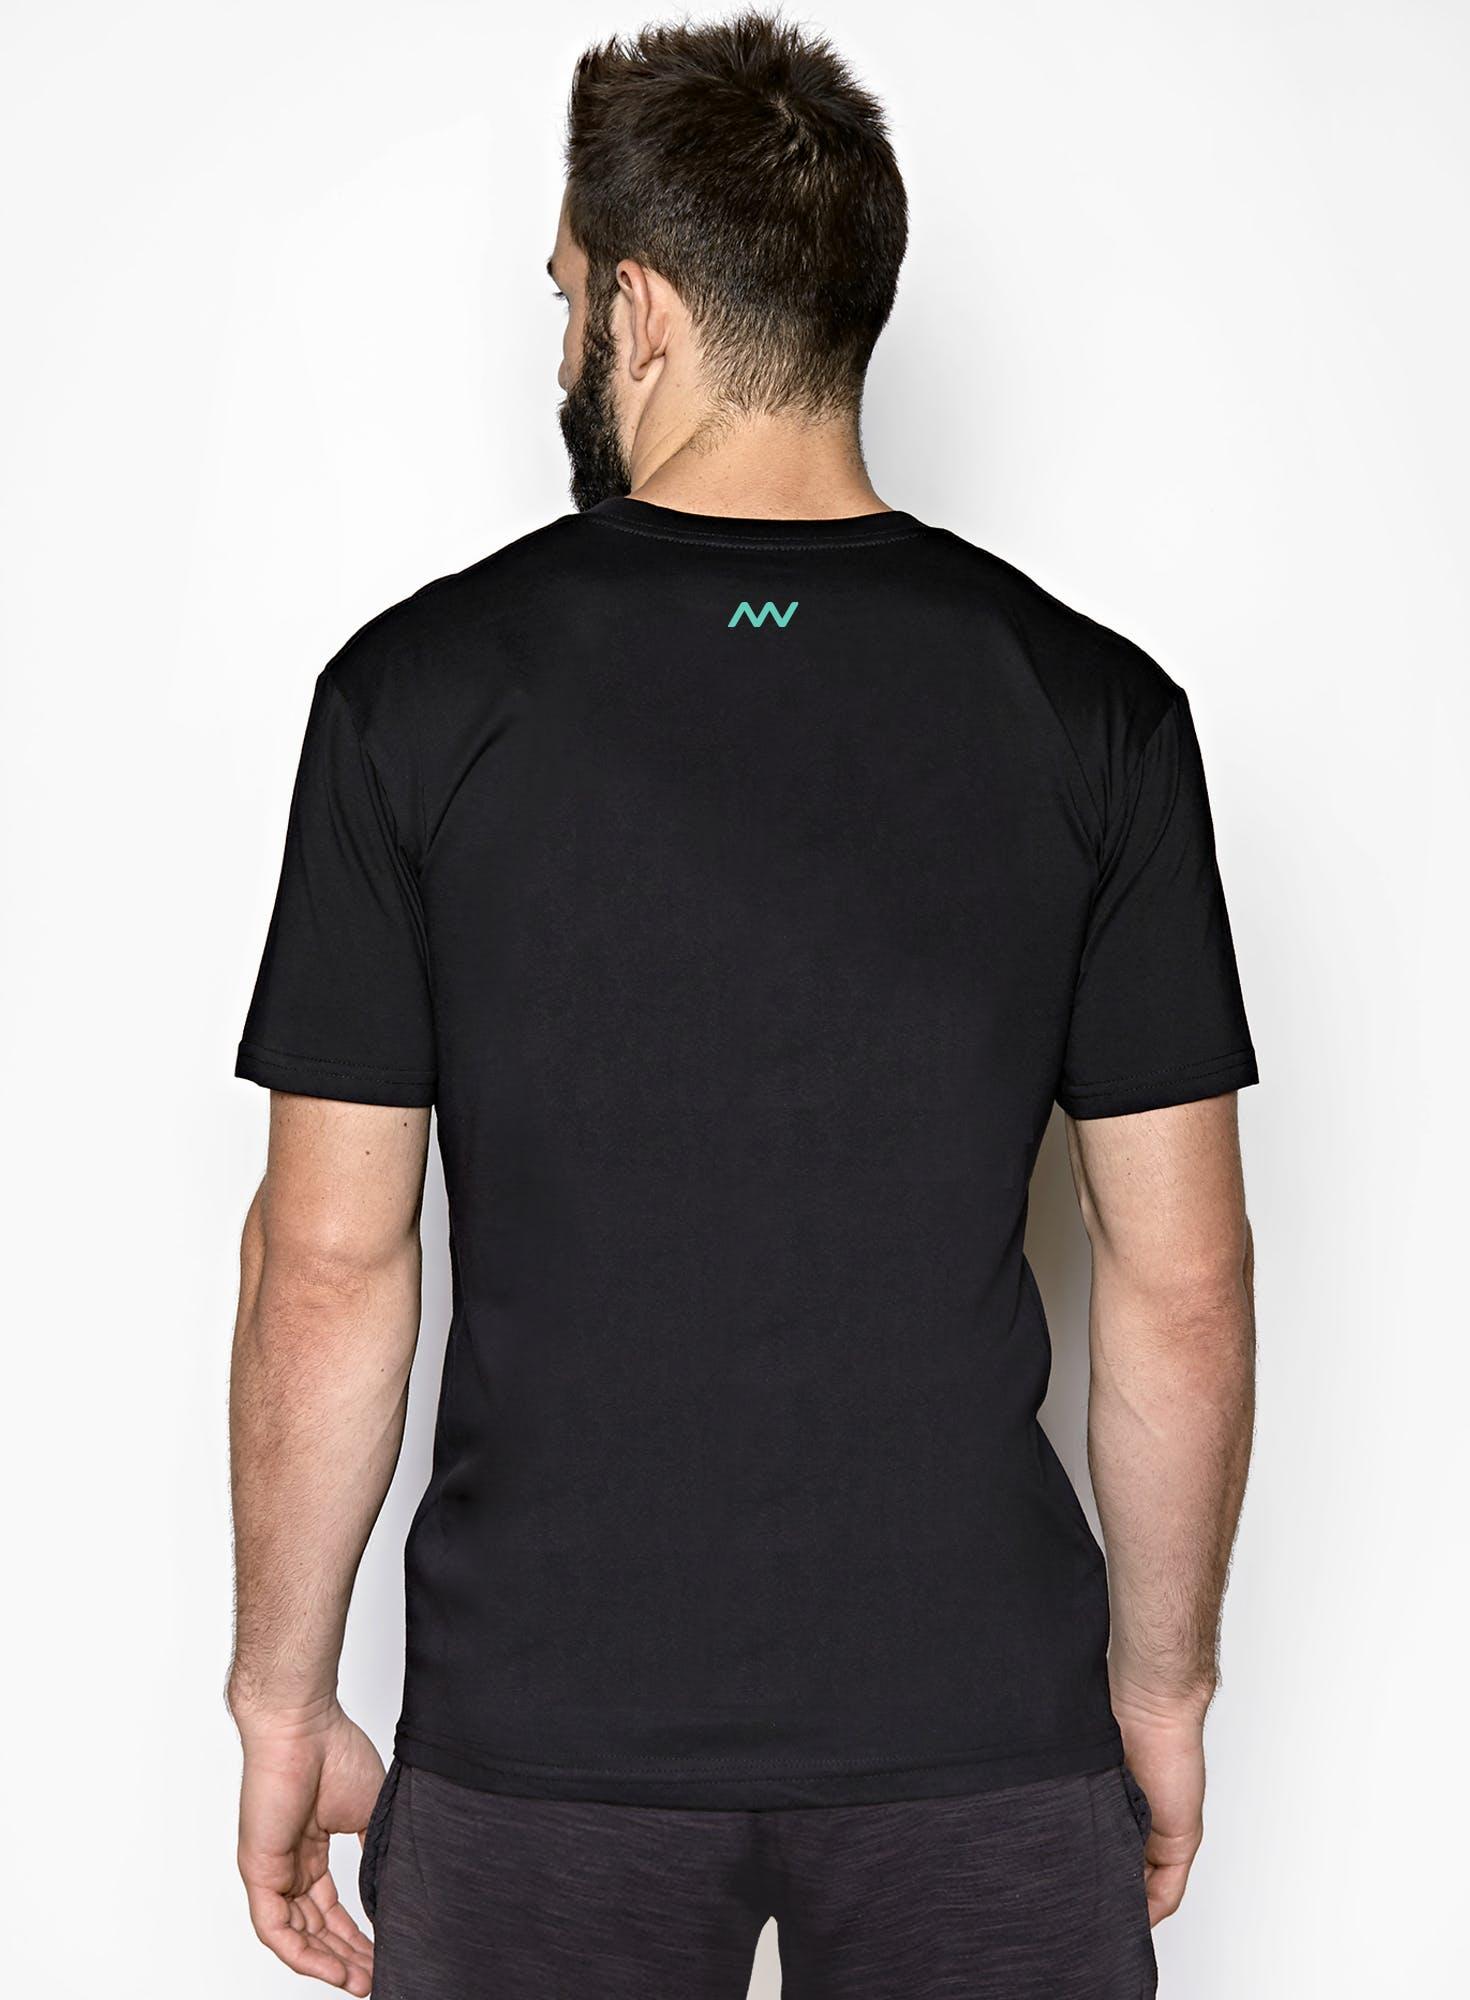 Onnit Capsule Texture T-Shirt Bonus Image